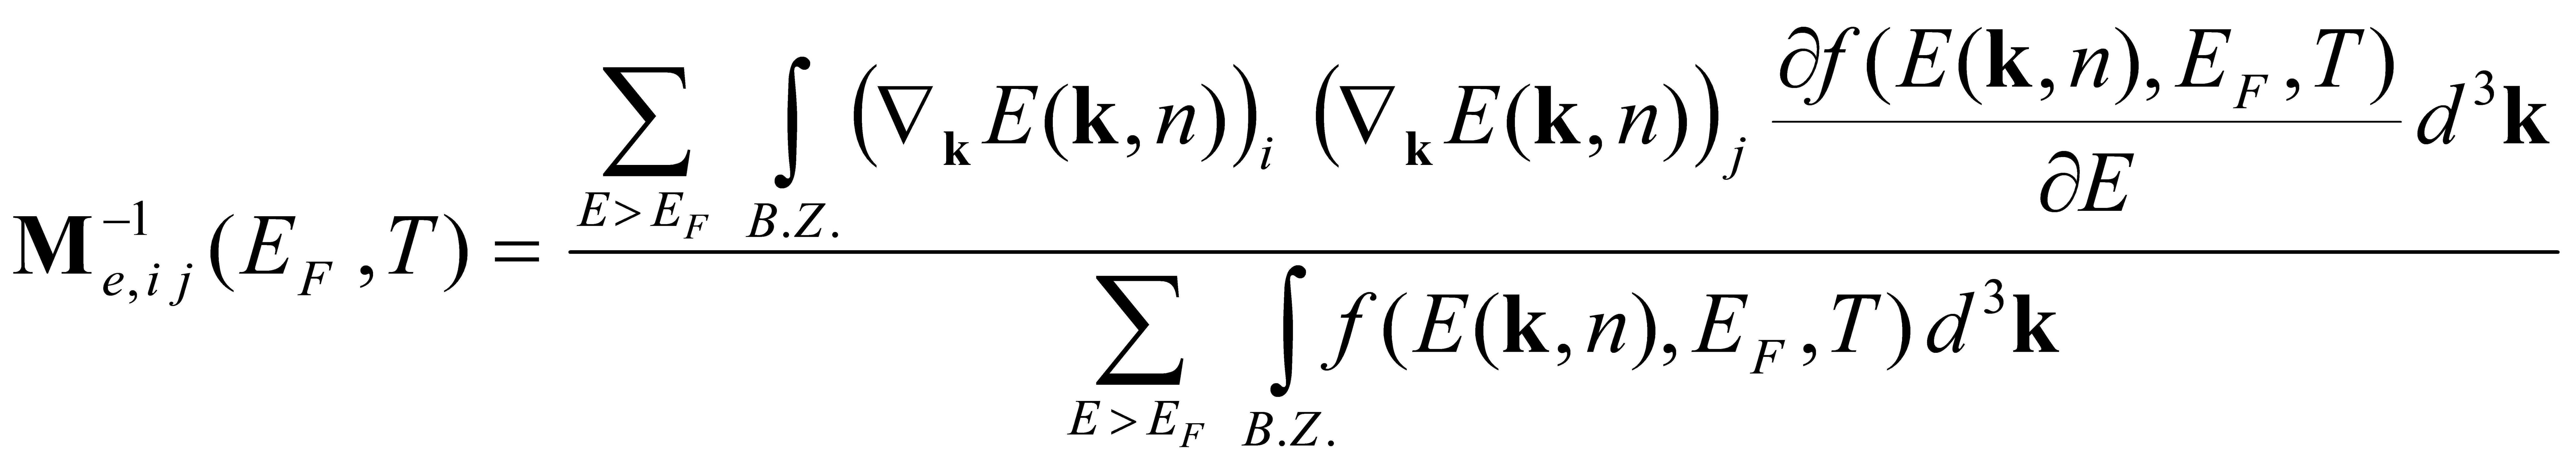 Figure 02_image005